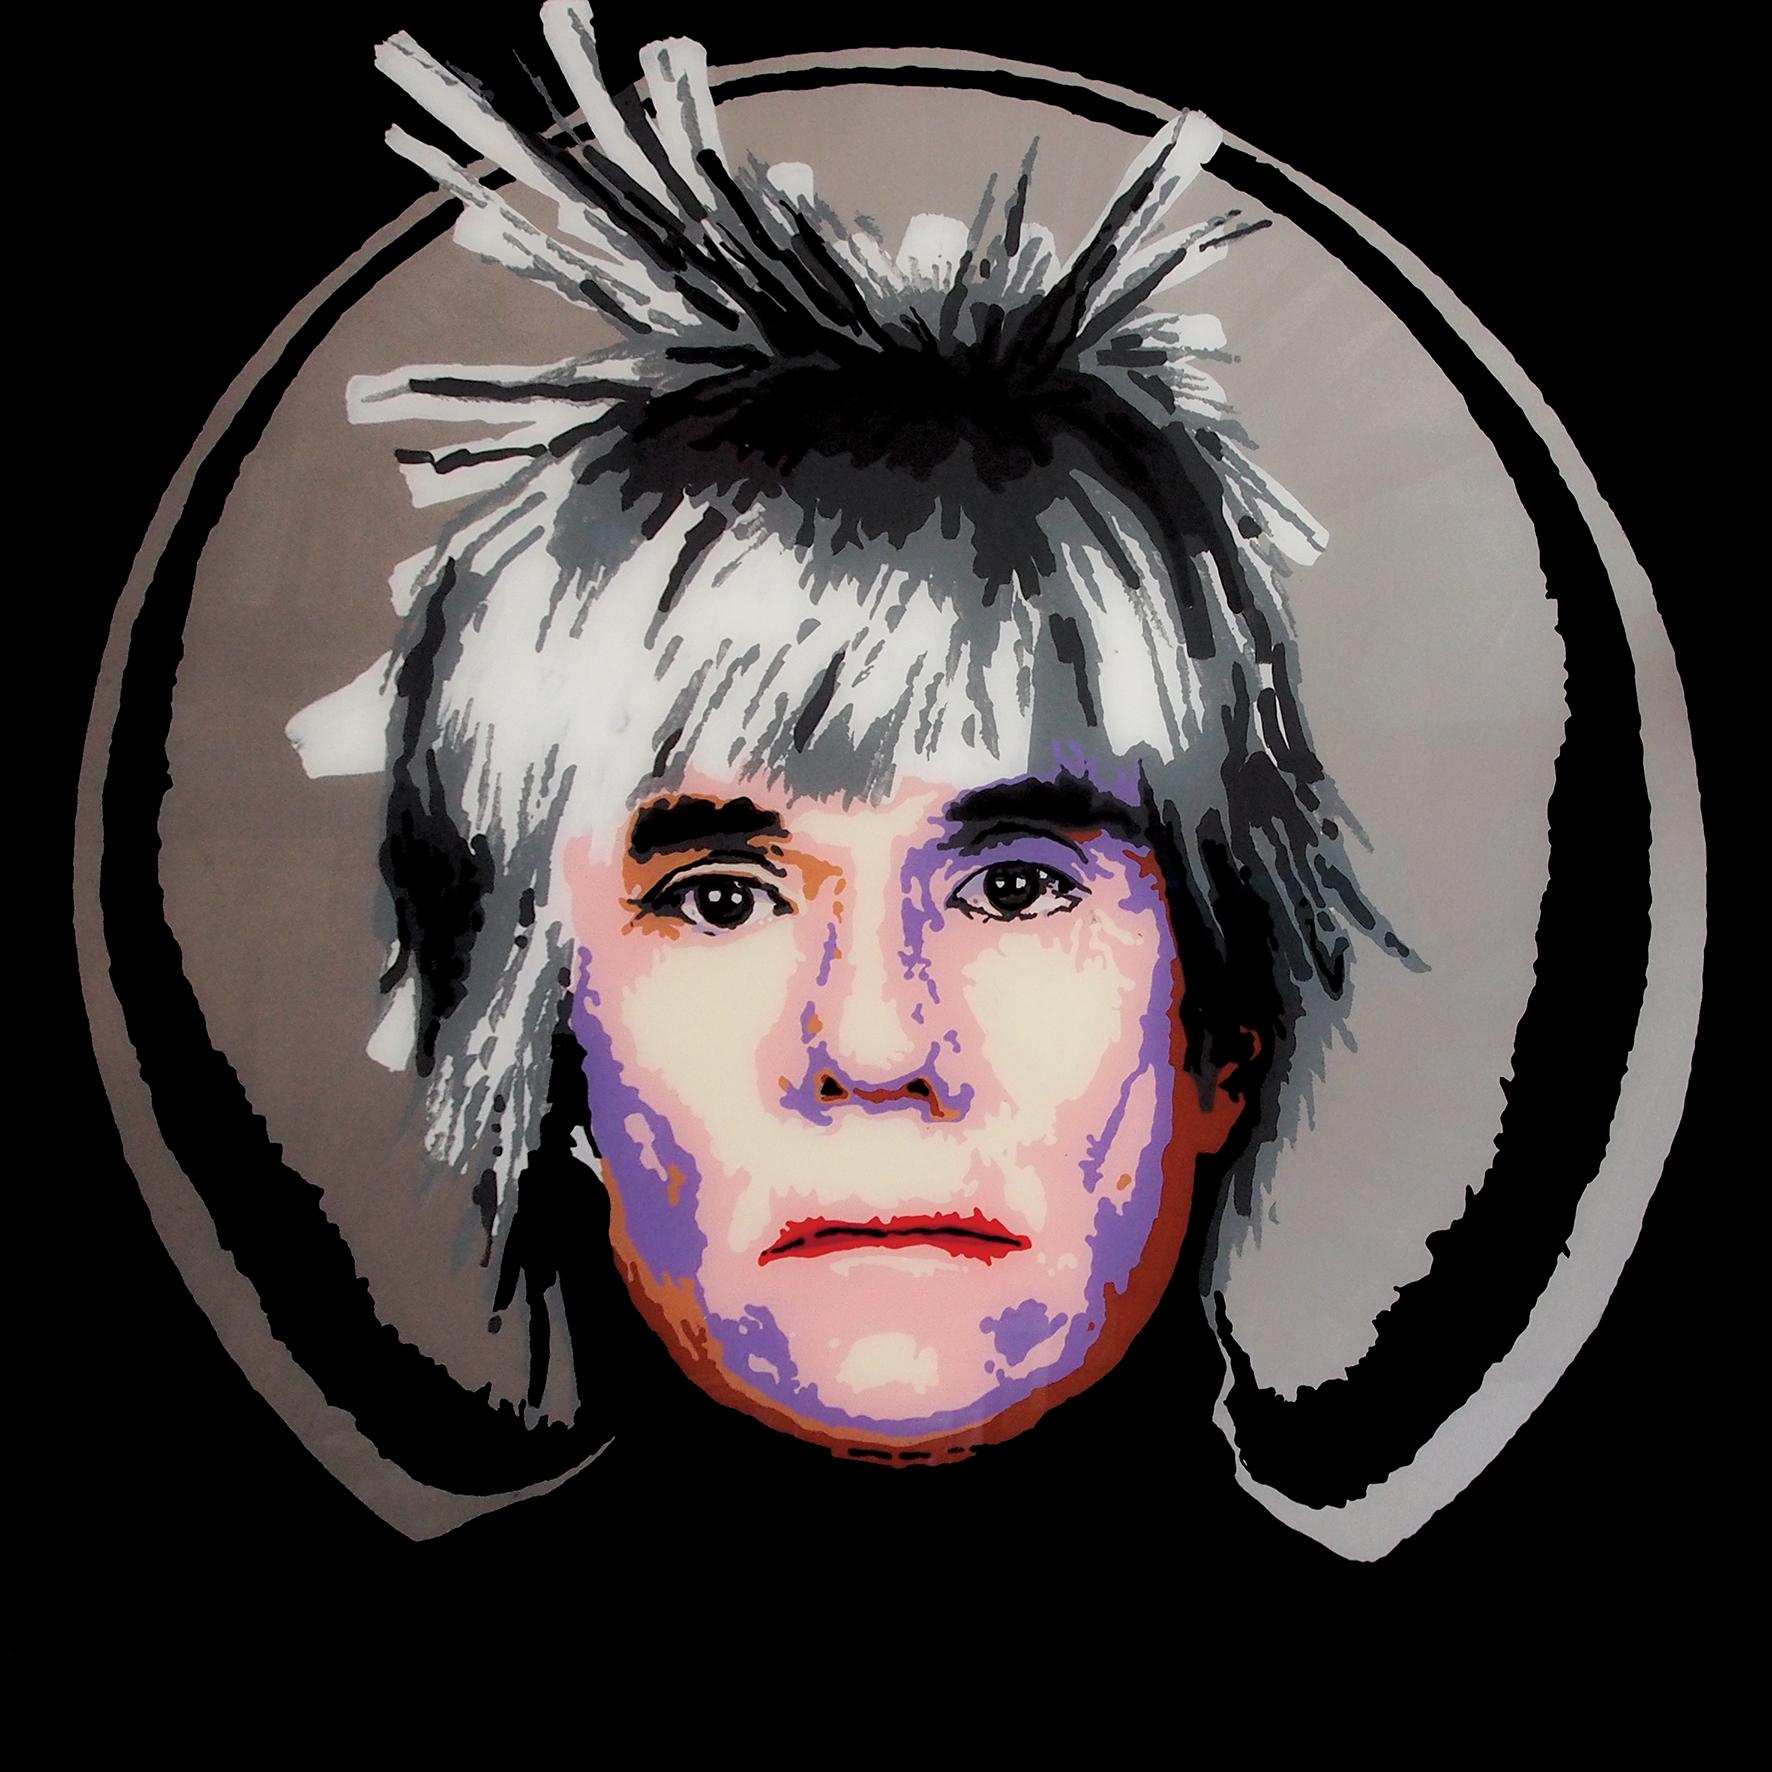 FABRYKA PORTRETU - Warhol, 100 x 100, akryl na pleksi, 2013